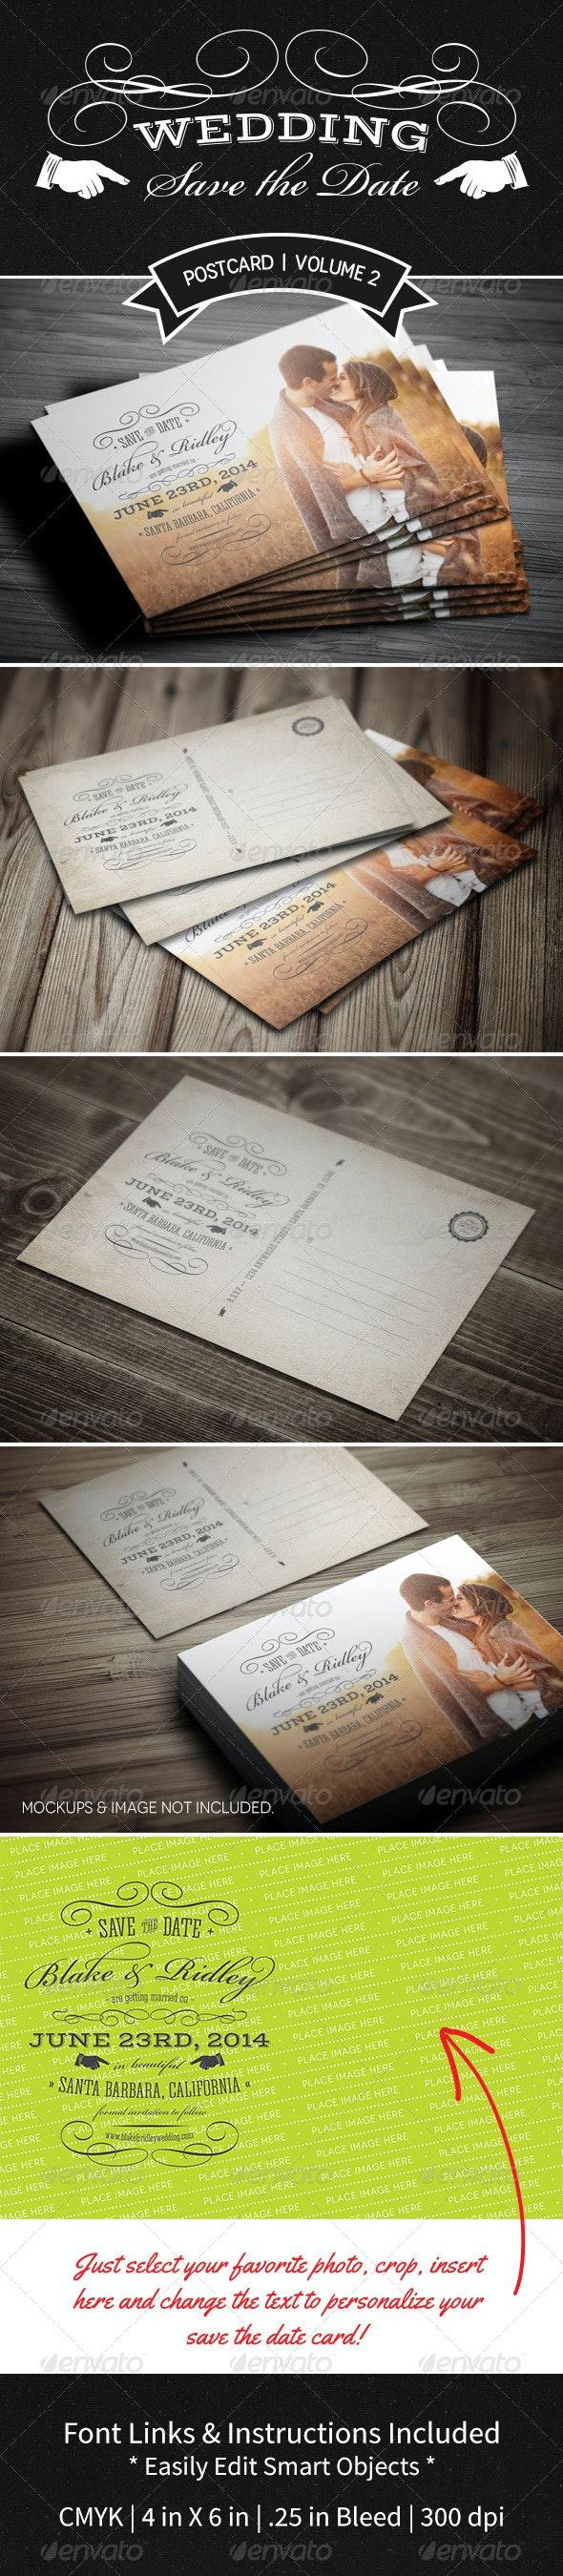 Save The Date Postcard | Volume 2 - Weddings Cards & Invites